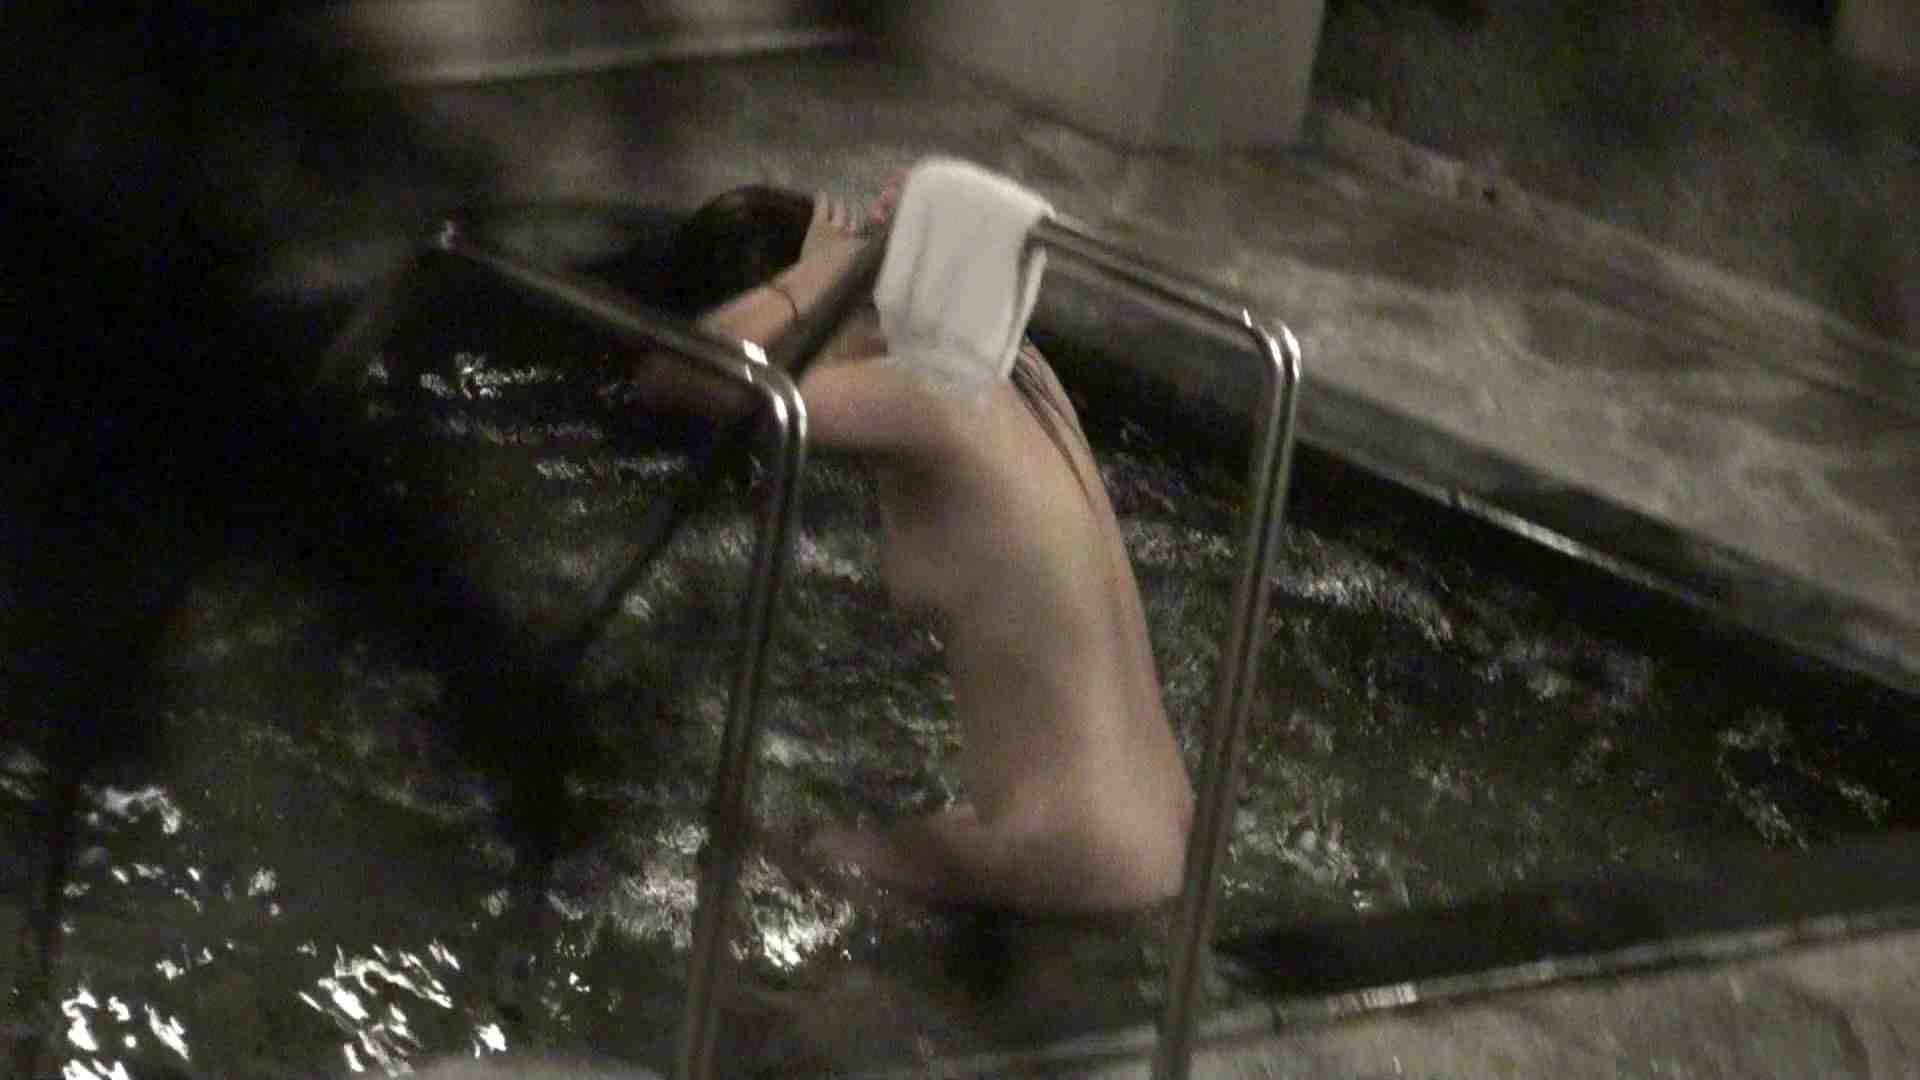 Aquaな露天風呂Vol.340 盗撮シリーズ | 露天風呂編  91PIX 39